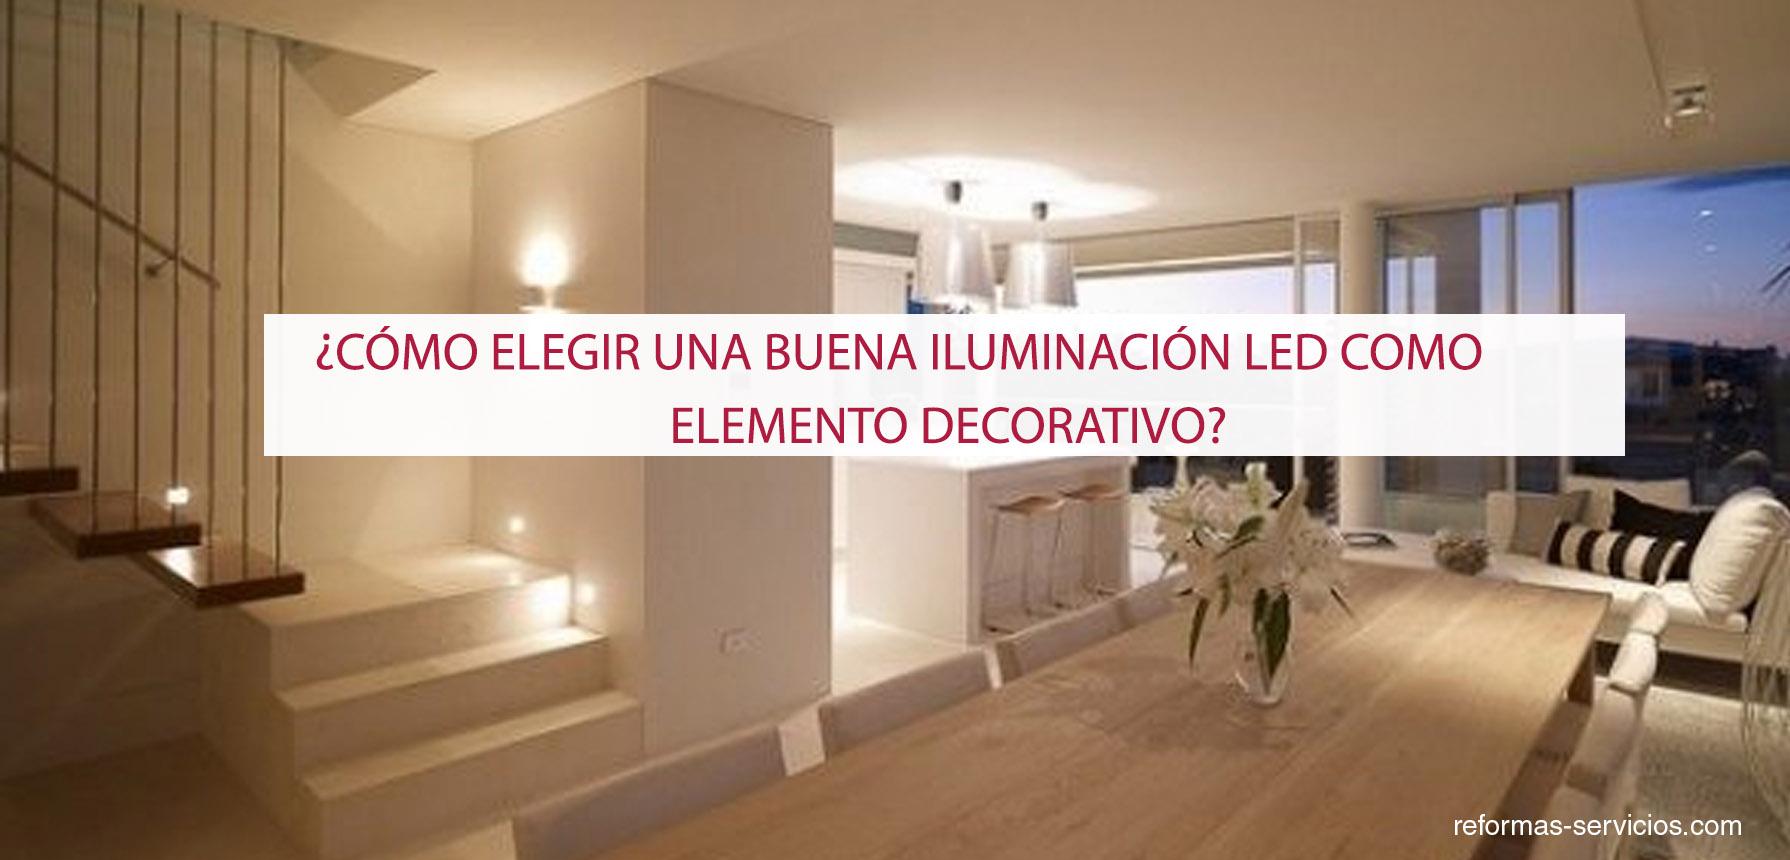 Iluminaci n led - Iluminacion led hogar ...